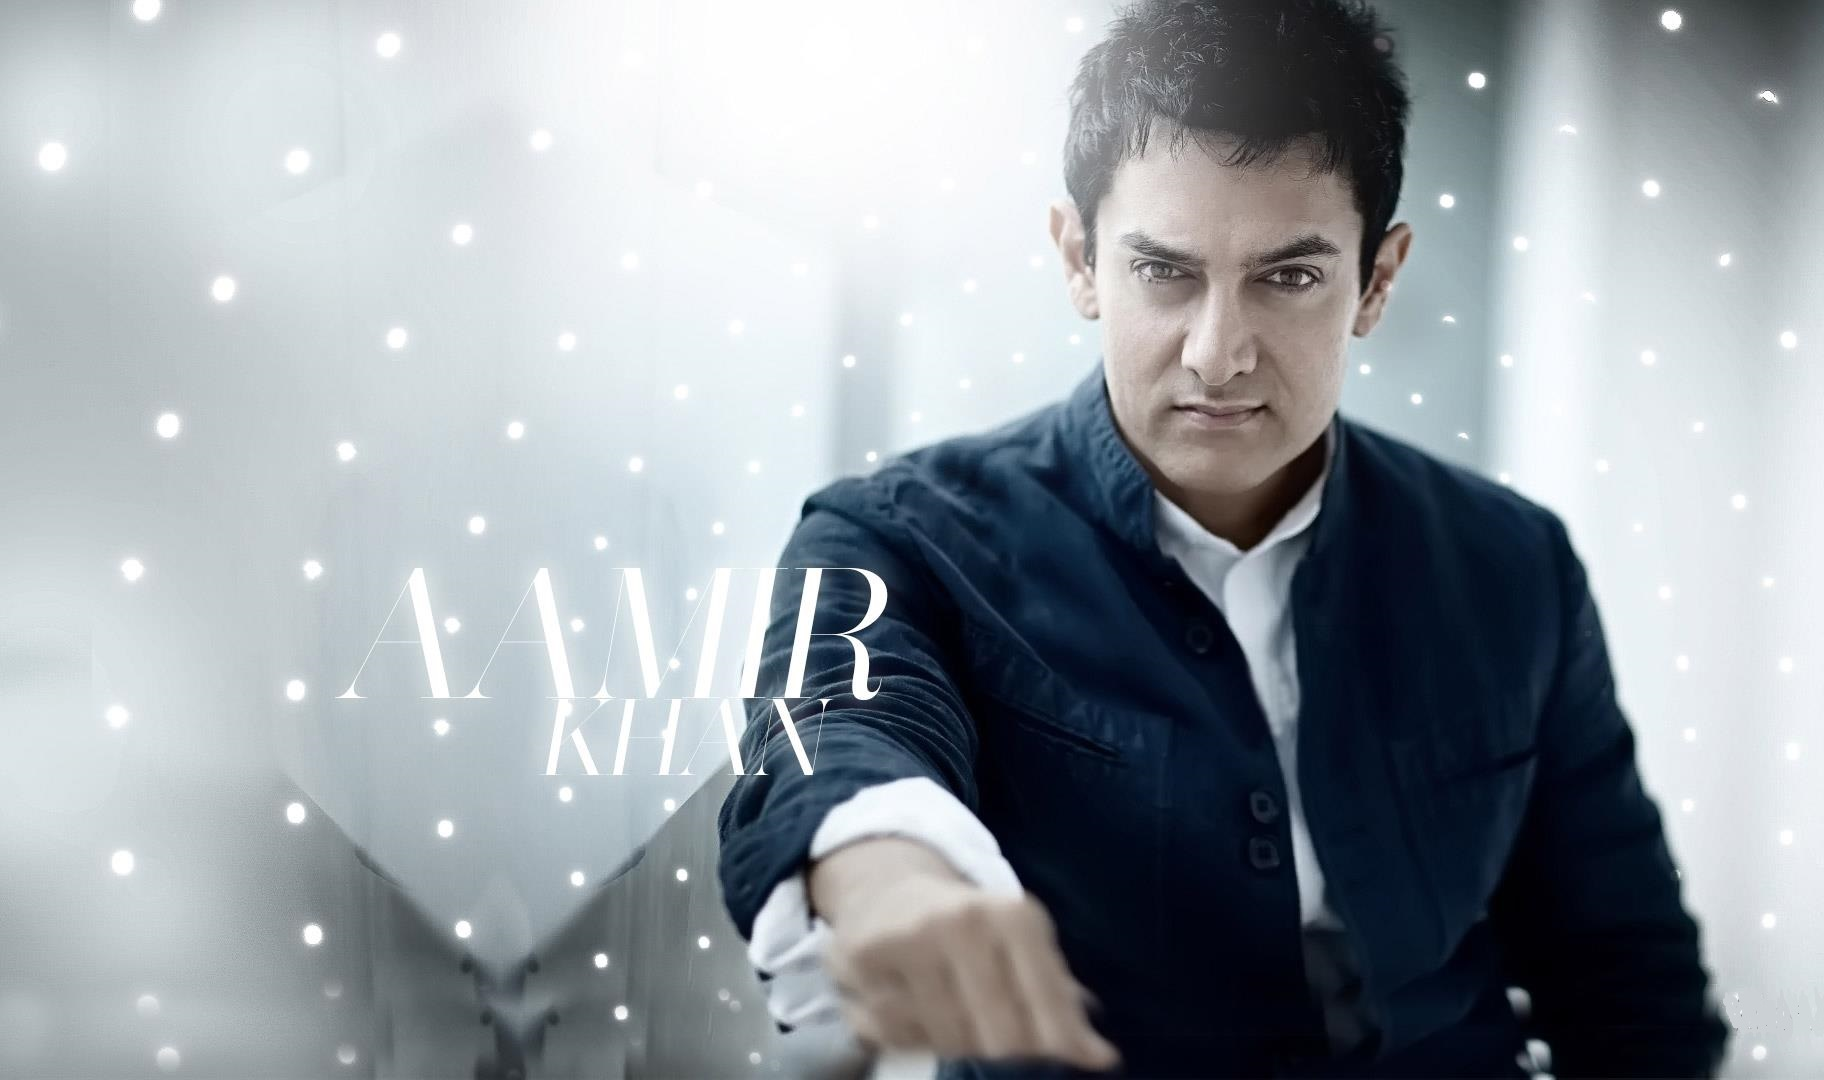 Aamir Khan latest wallpapers Wallpaper HD Celebrities 4K 1824x1080